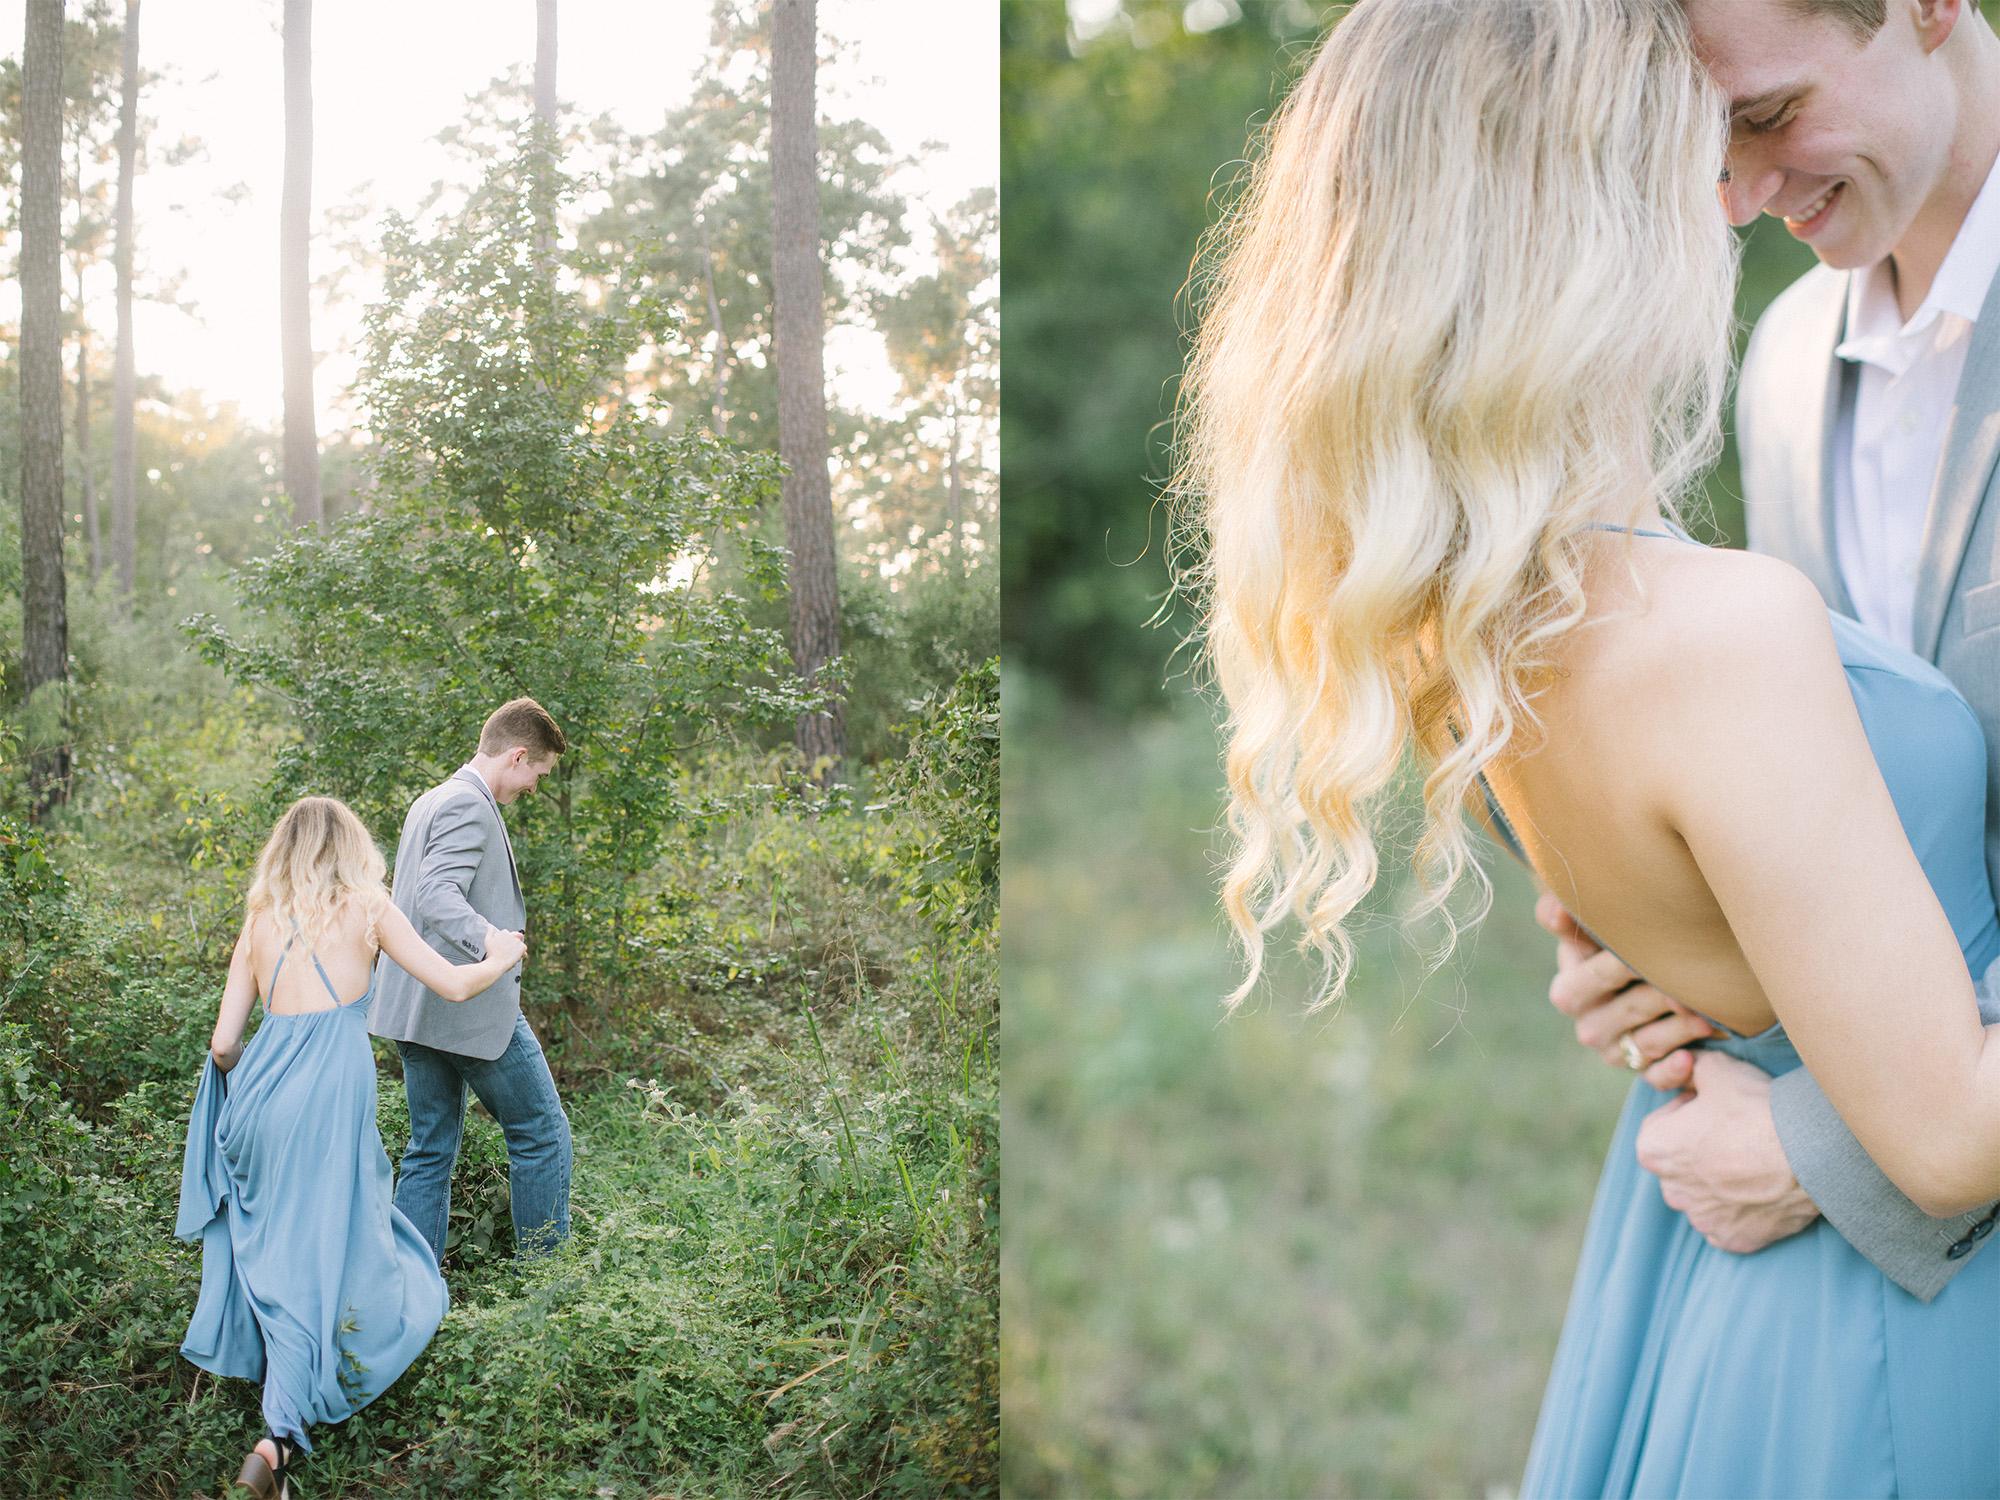 Ellen-Ashton-Photography-Dallas-Wedding-Photographers-wed-and-prosperweddings-Dallas-Engagment-Session-The-Farmhouse-Events.jpg